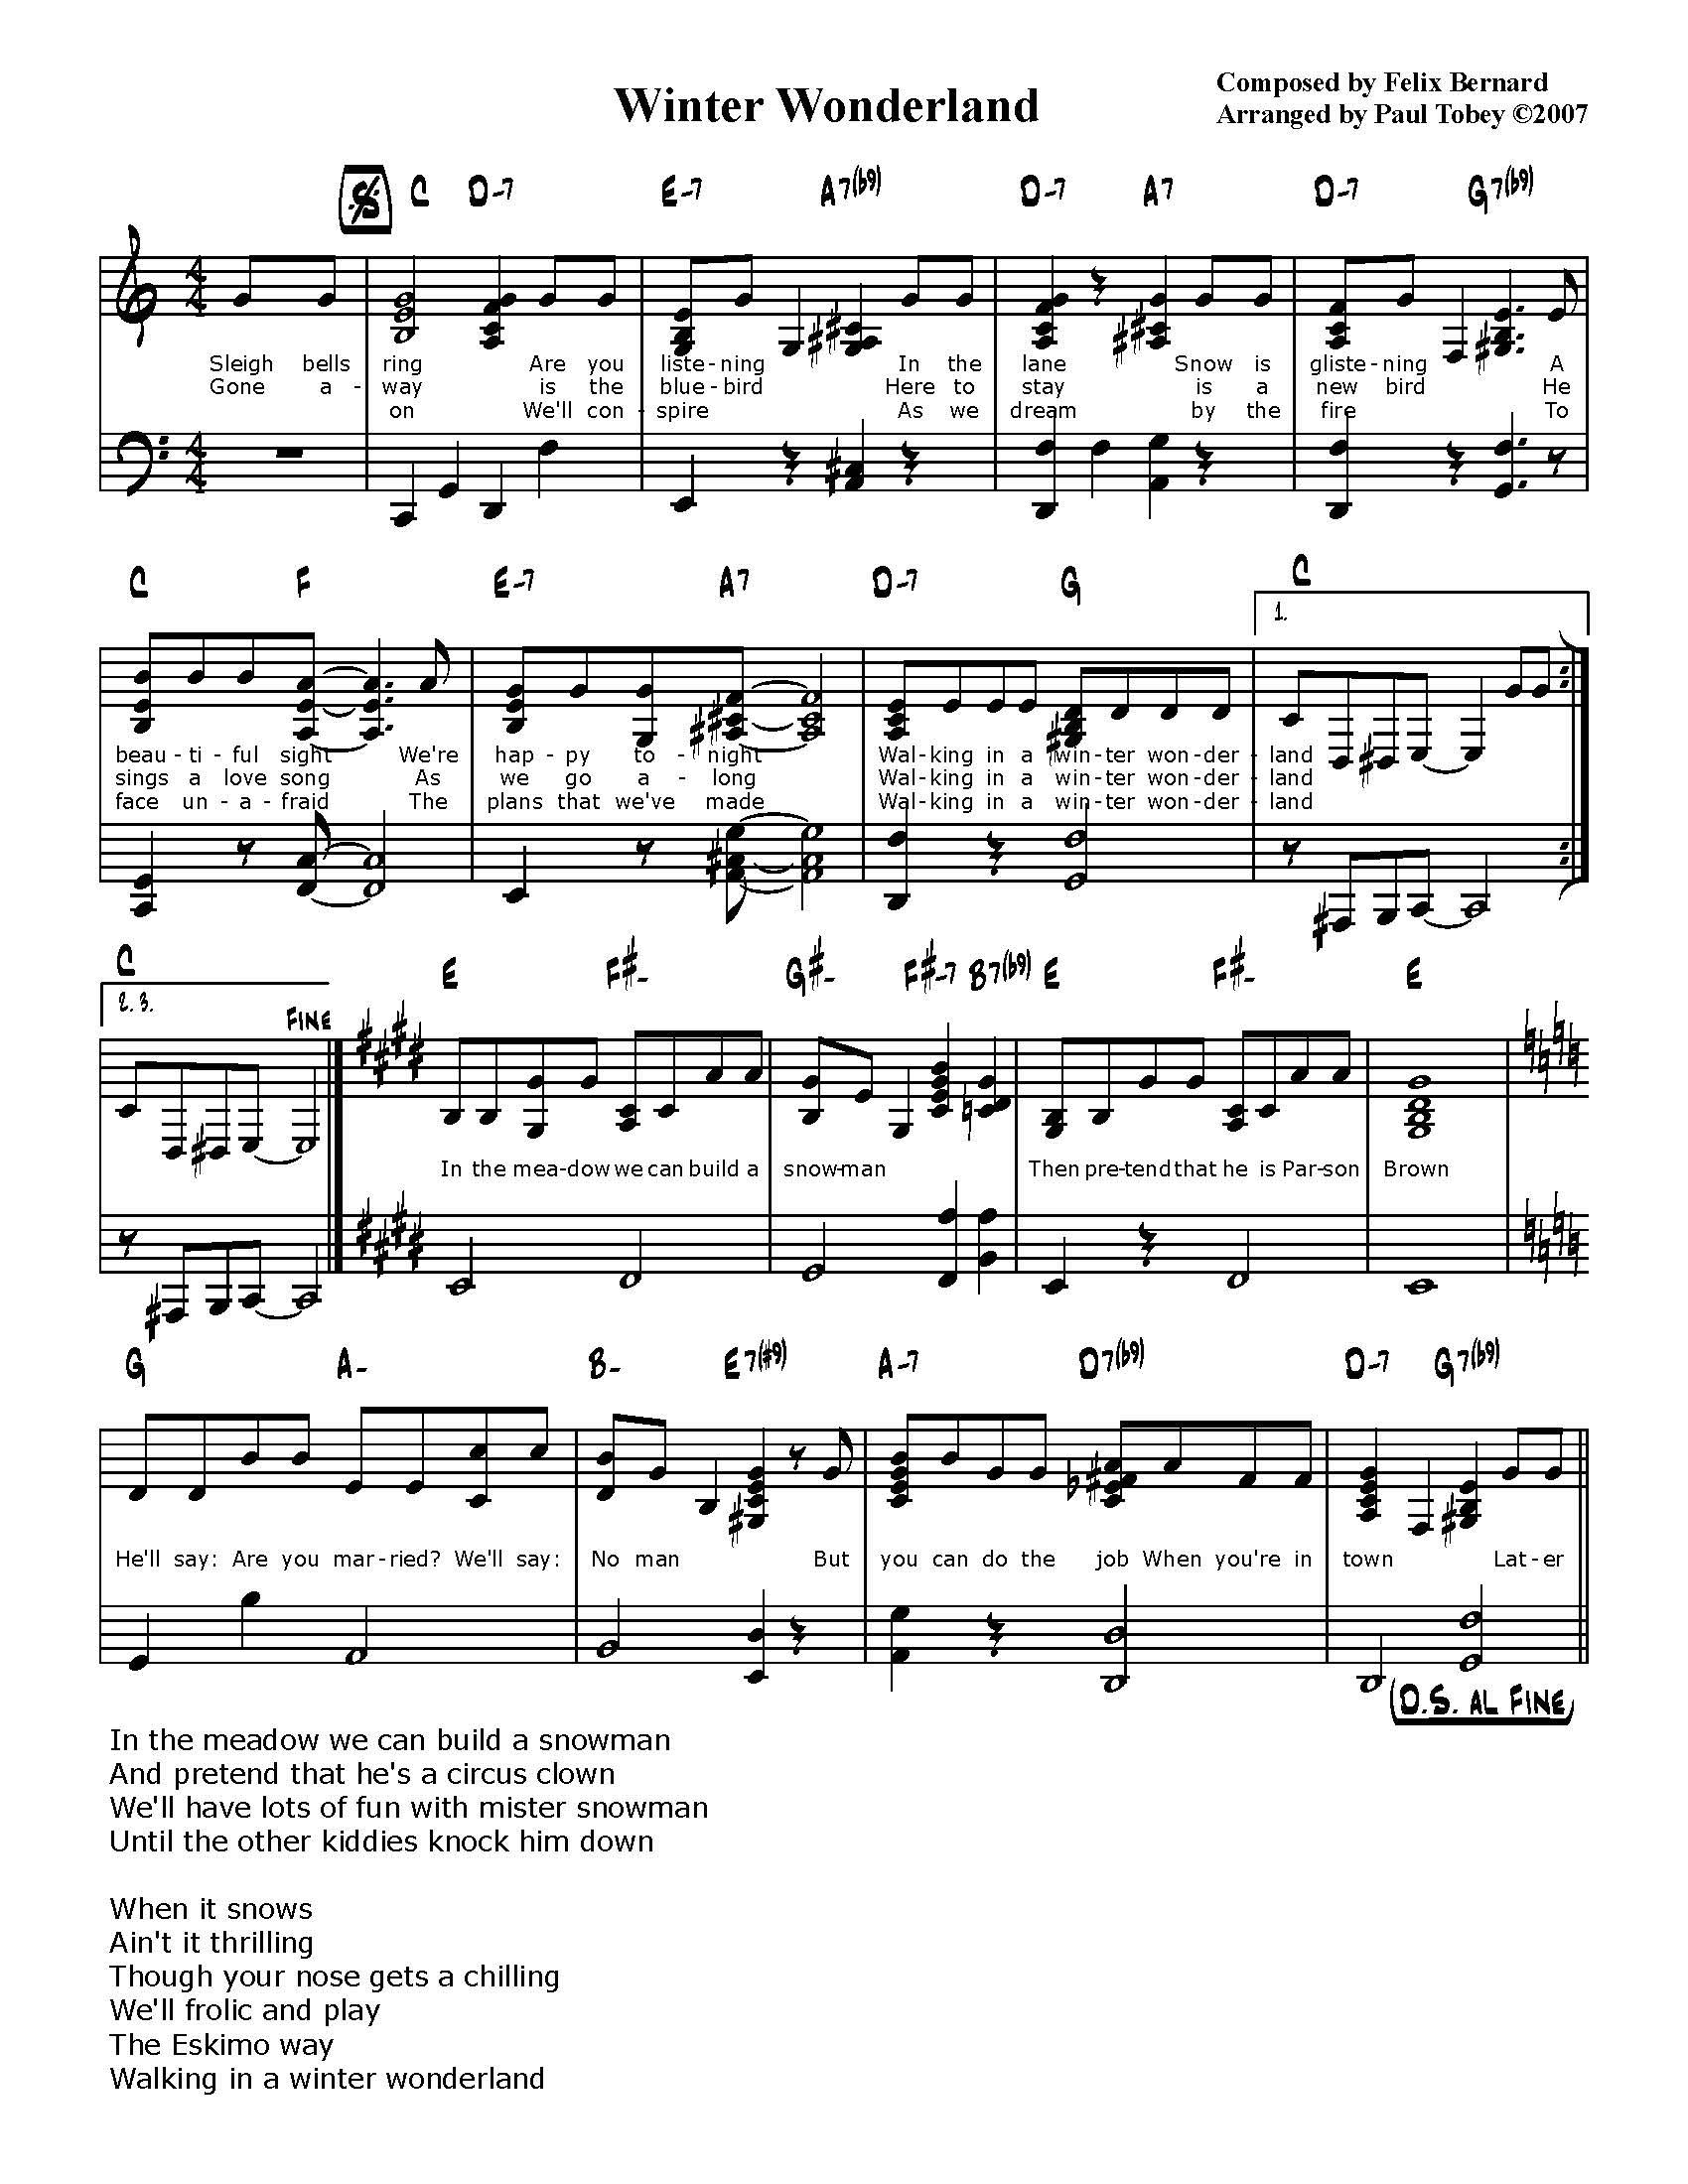 Winter Wonderland Sheet Music Erkalnathandedecker